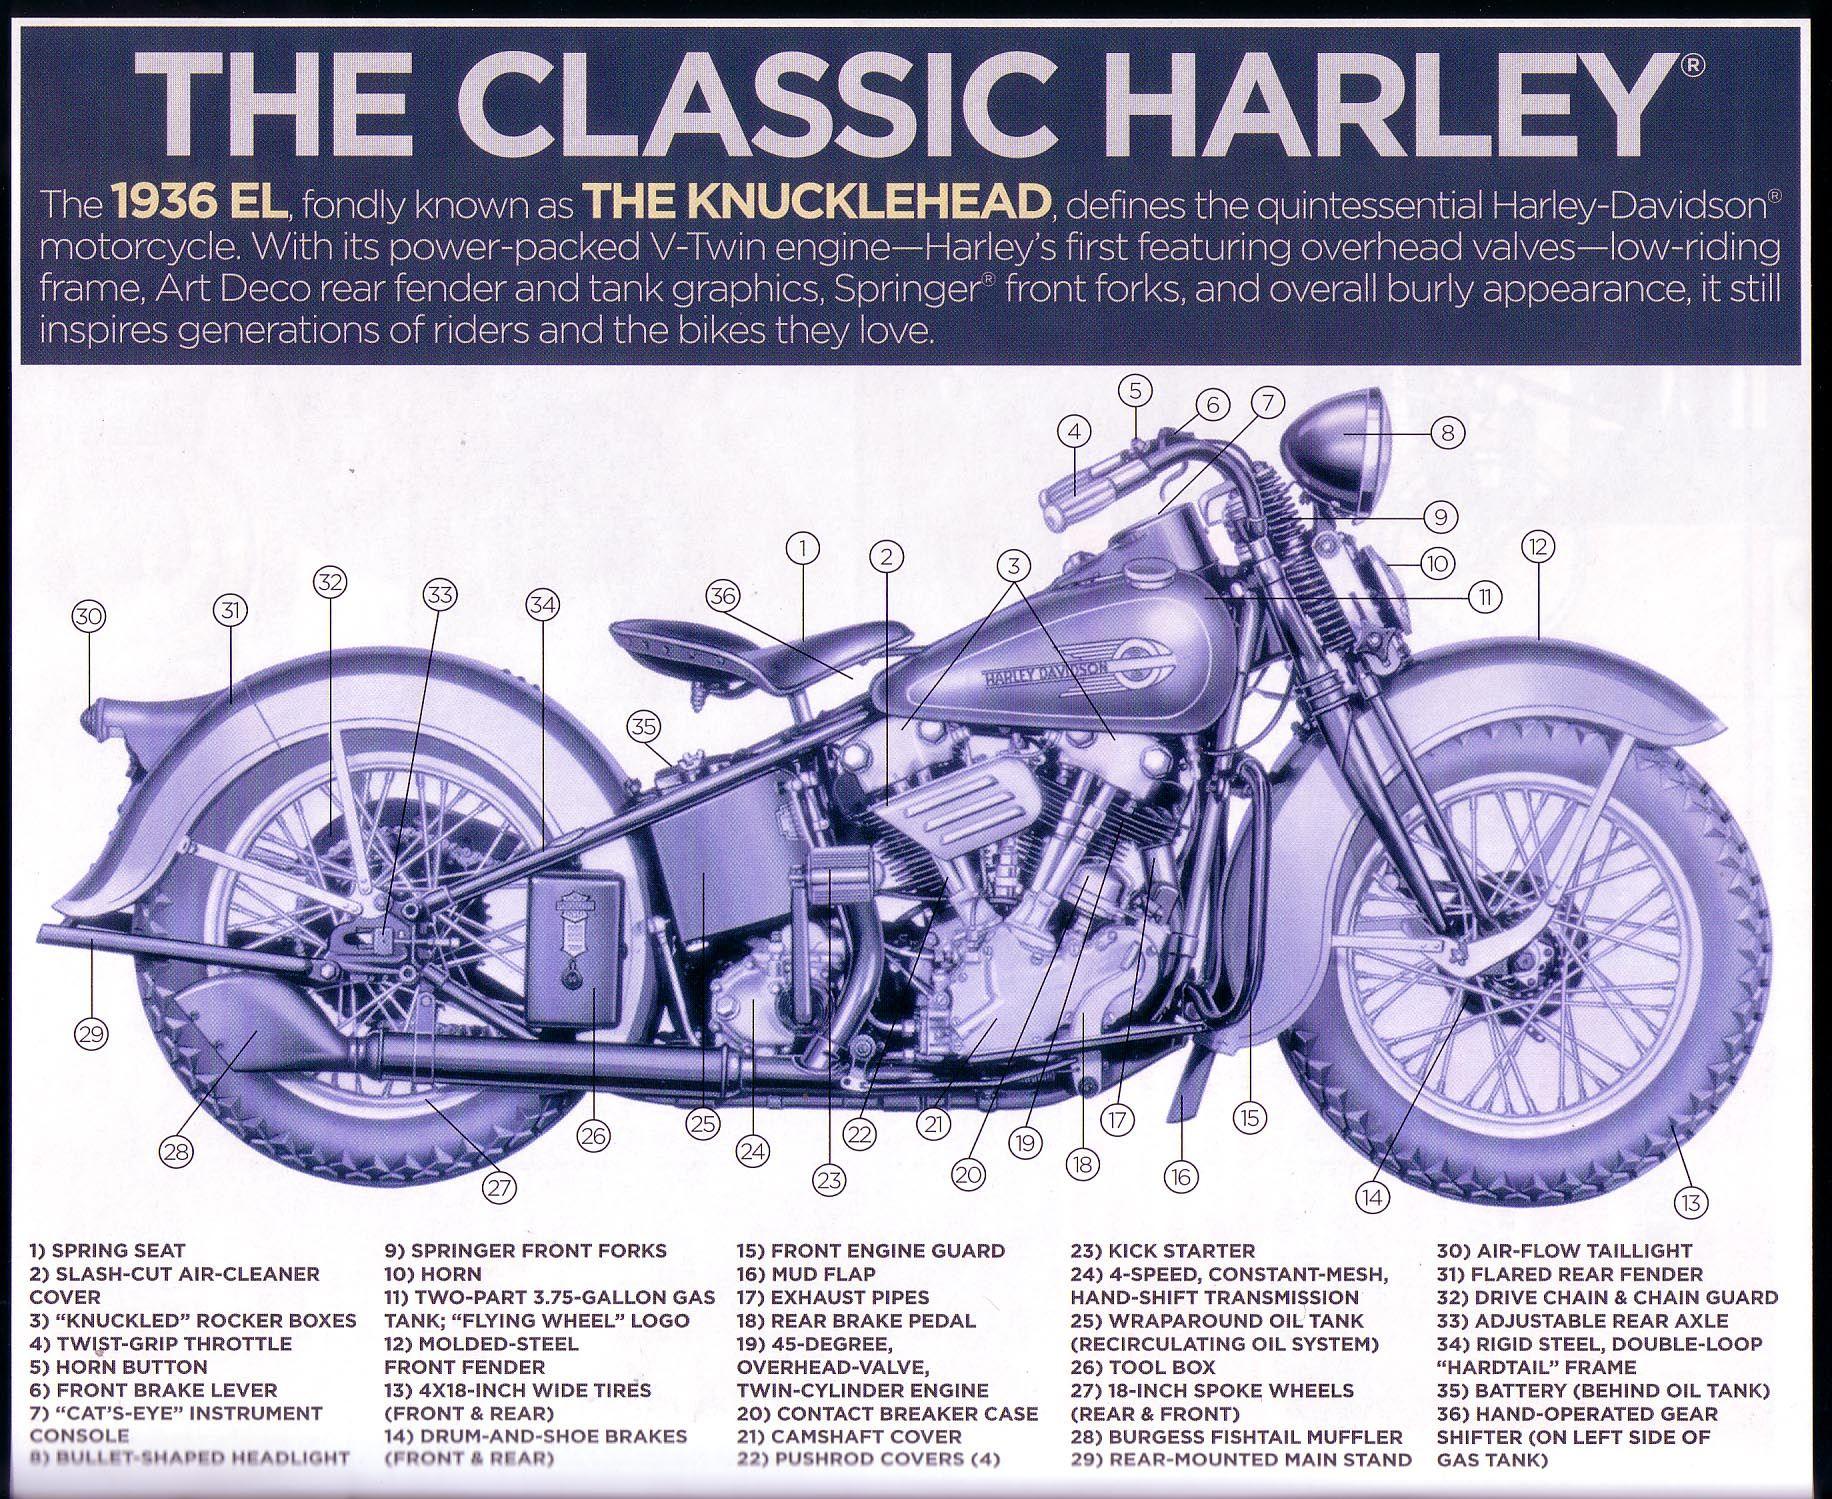 harley davidson motorcycle diagrams wiring diagrams harley evo parts diagram harley davidson motorcycle diagrams wiring diagram [ 1832 x 1499 Pixel ]